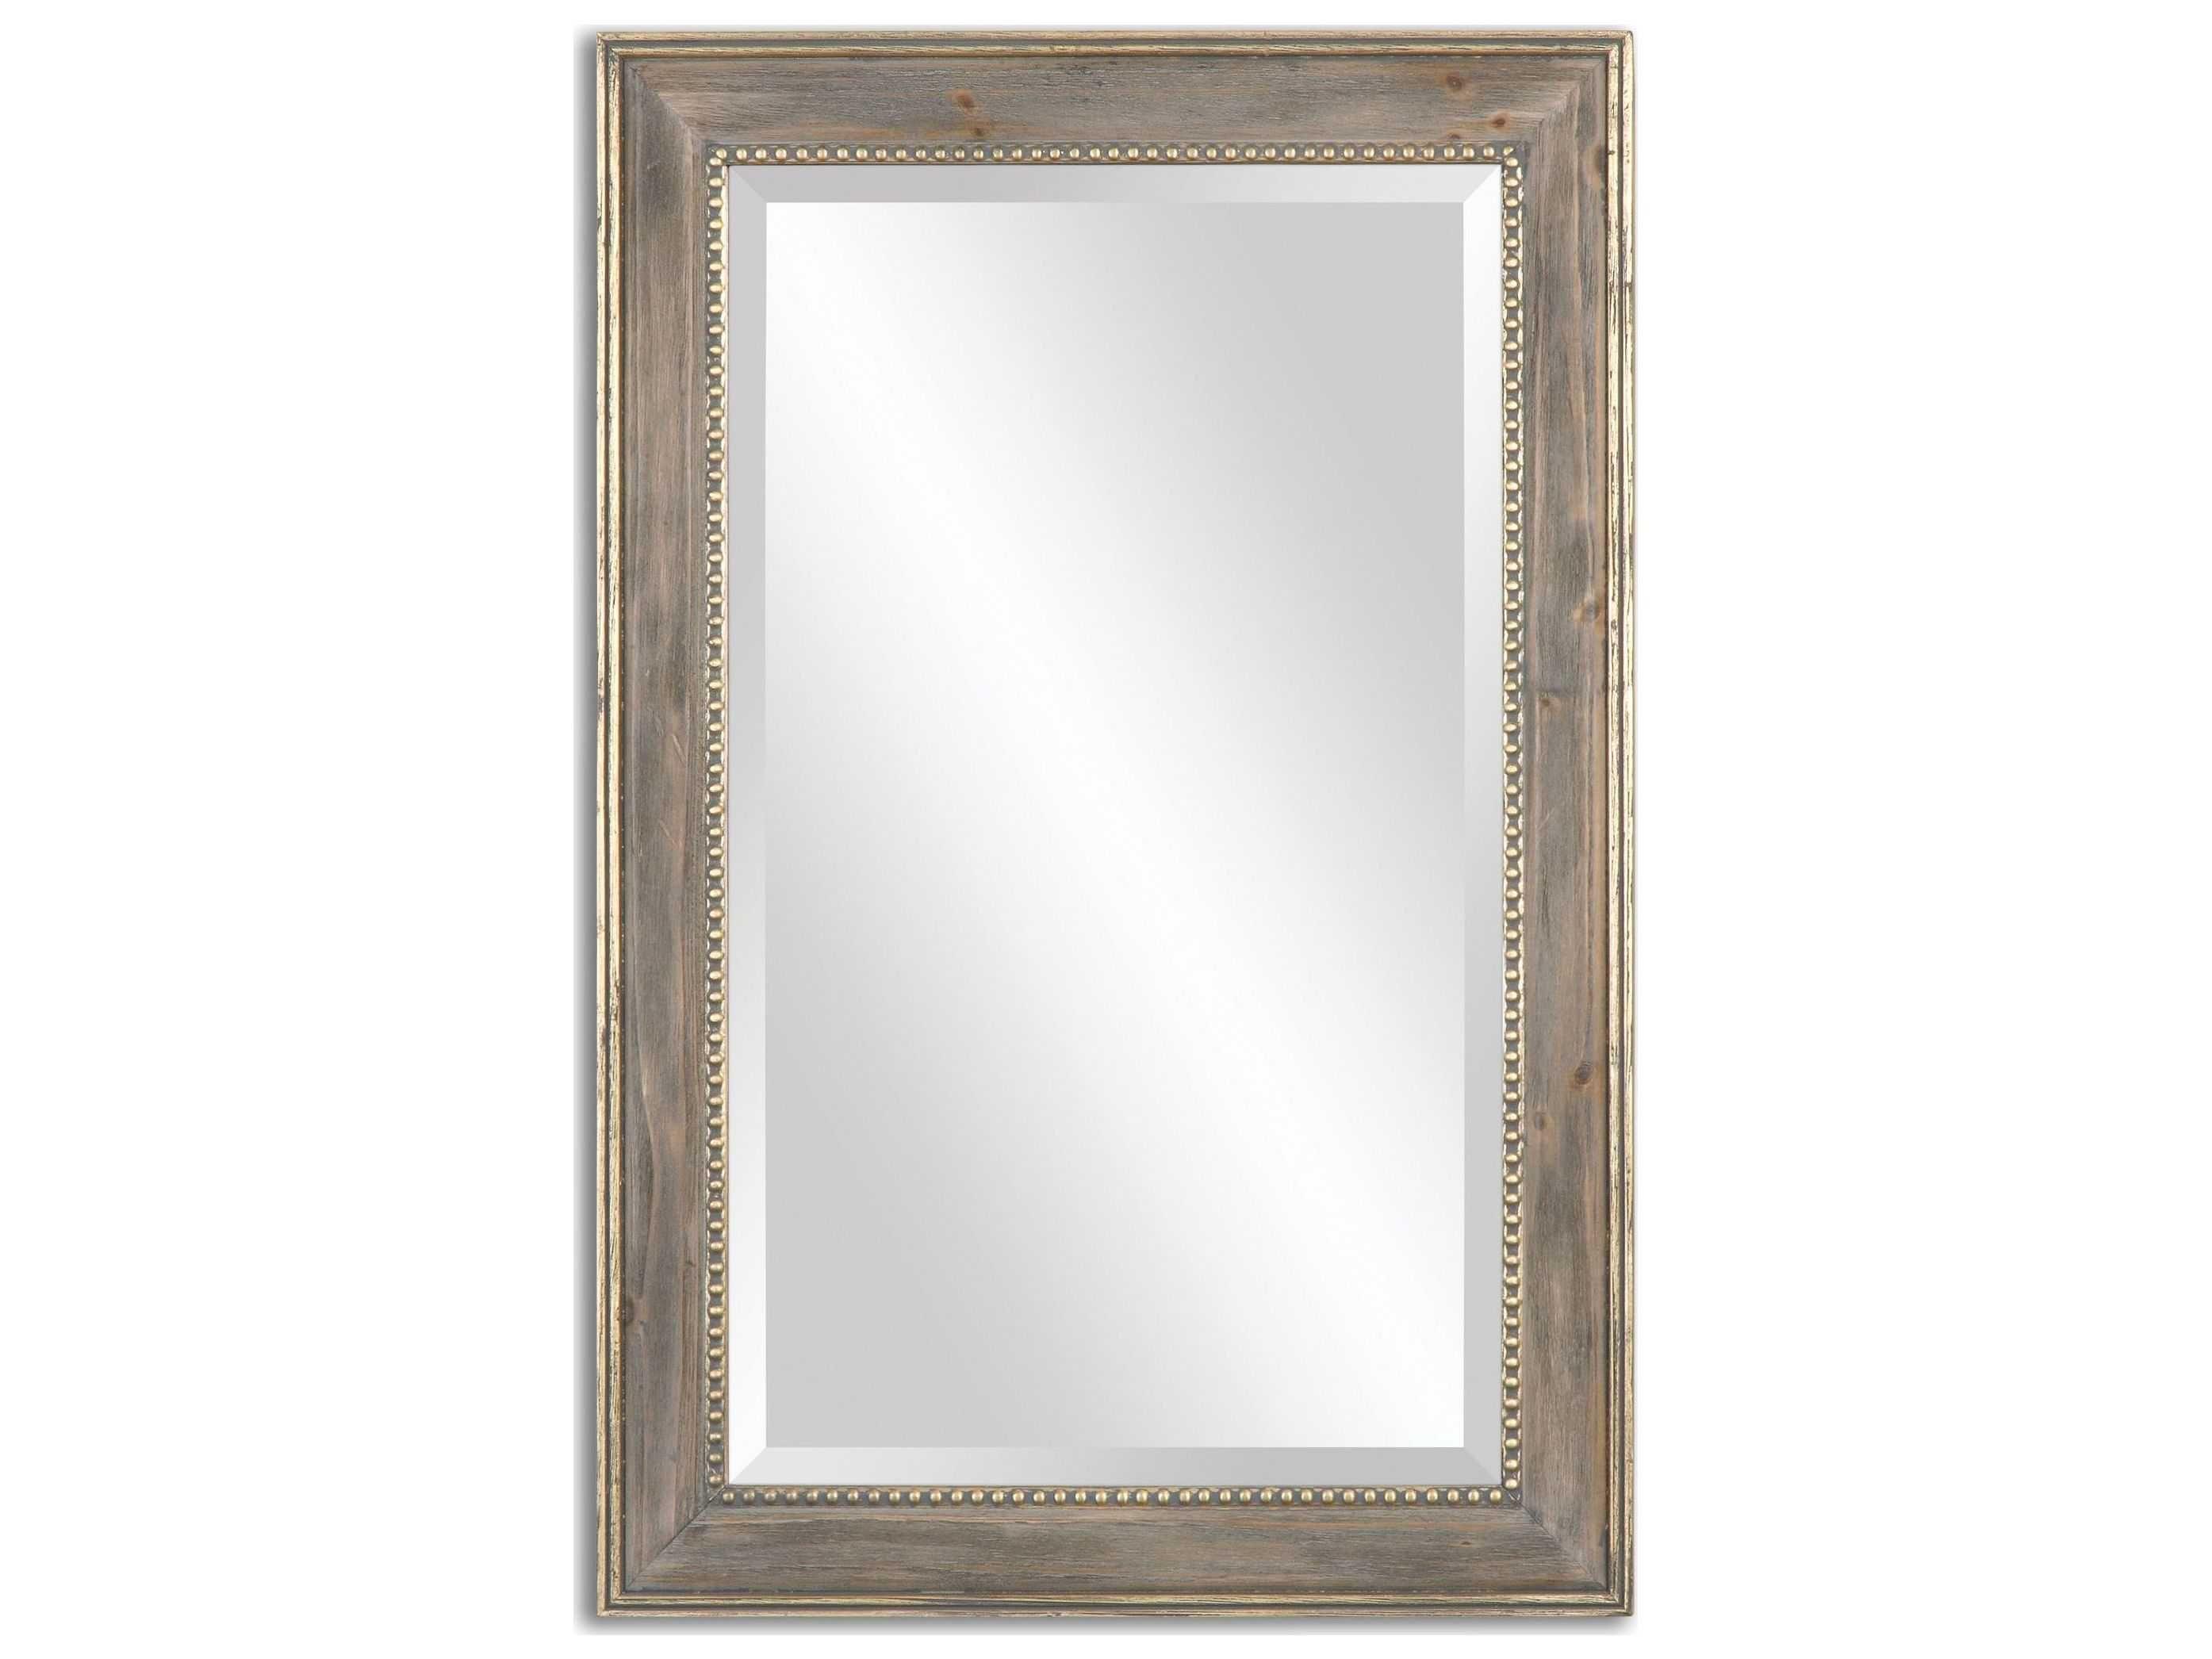 Uttermost Quintina 24 X 36 Pine Wall Mirror Framed Mirror Wall Mirror Design Wall Lighted Wall Mirror 24 x 36 framed mirrors